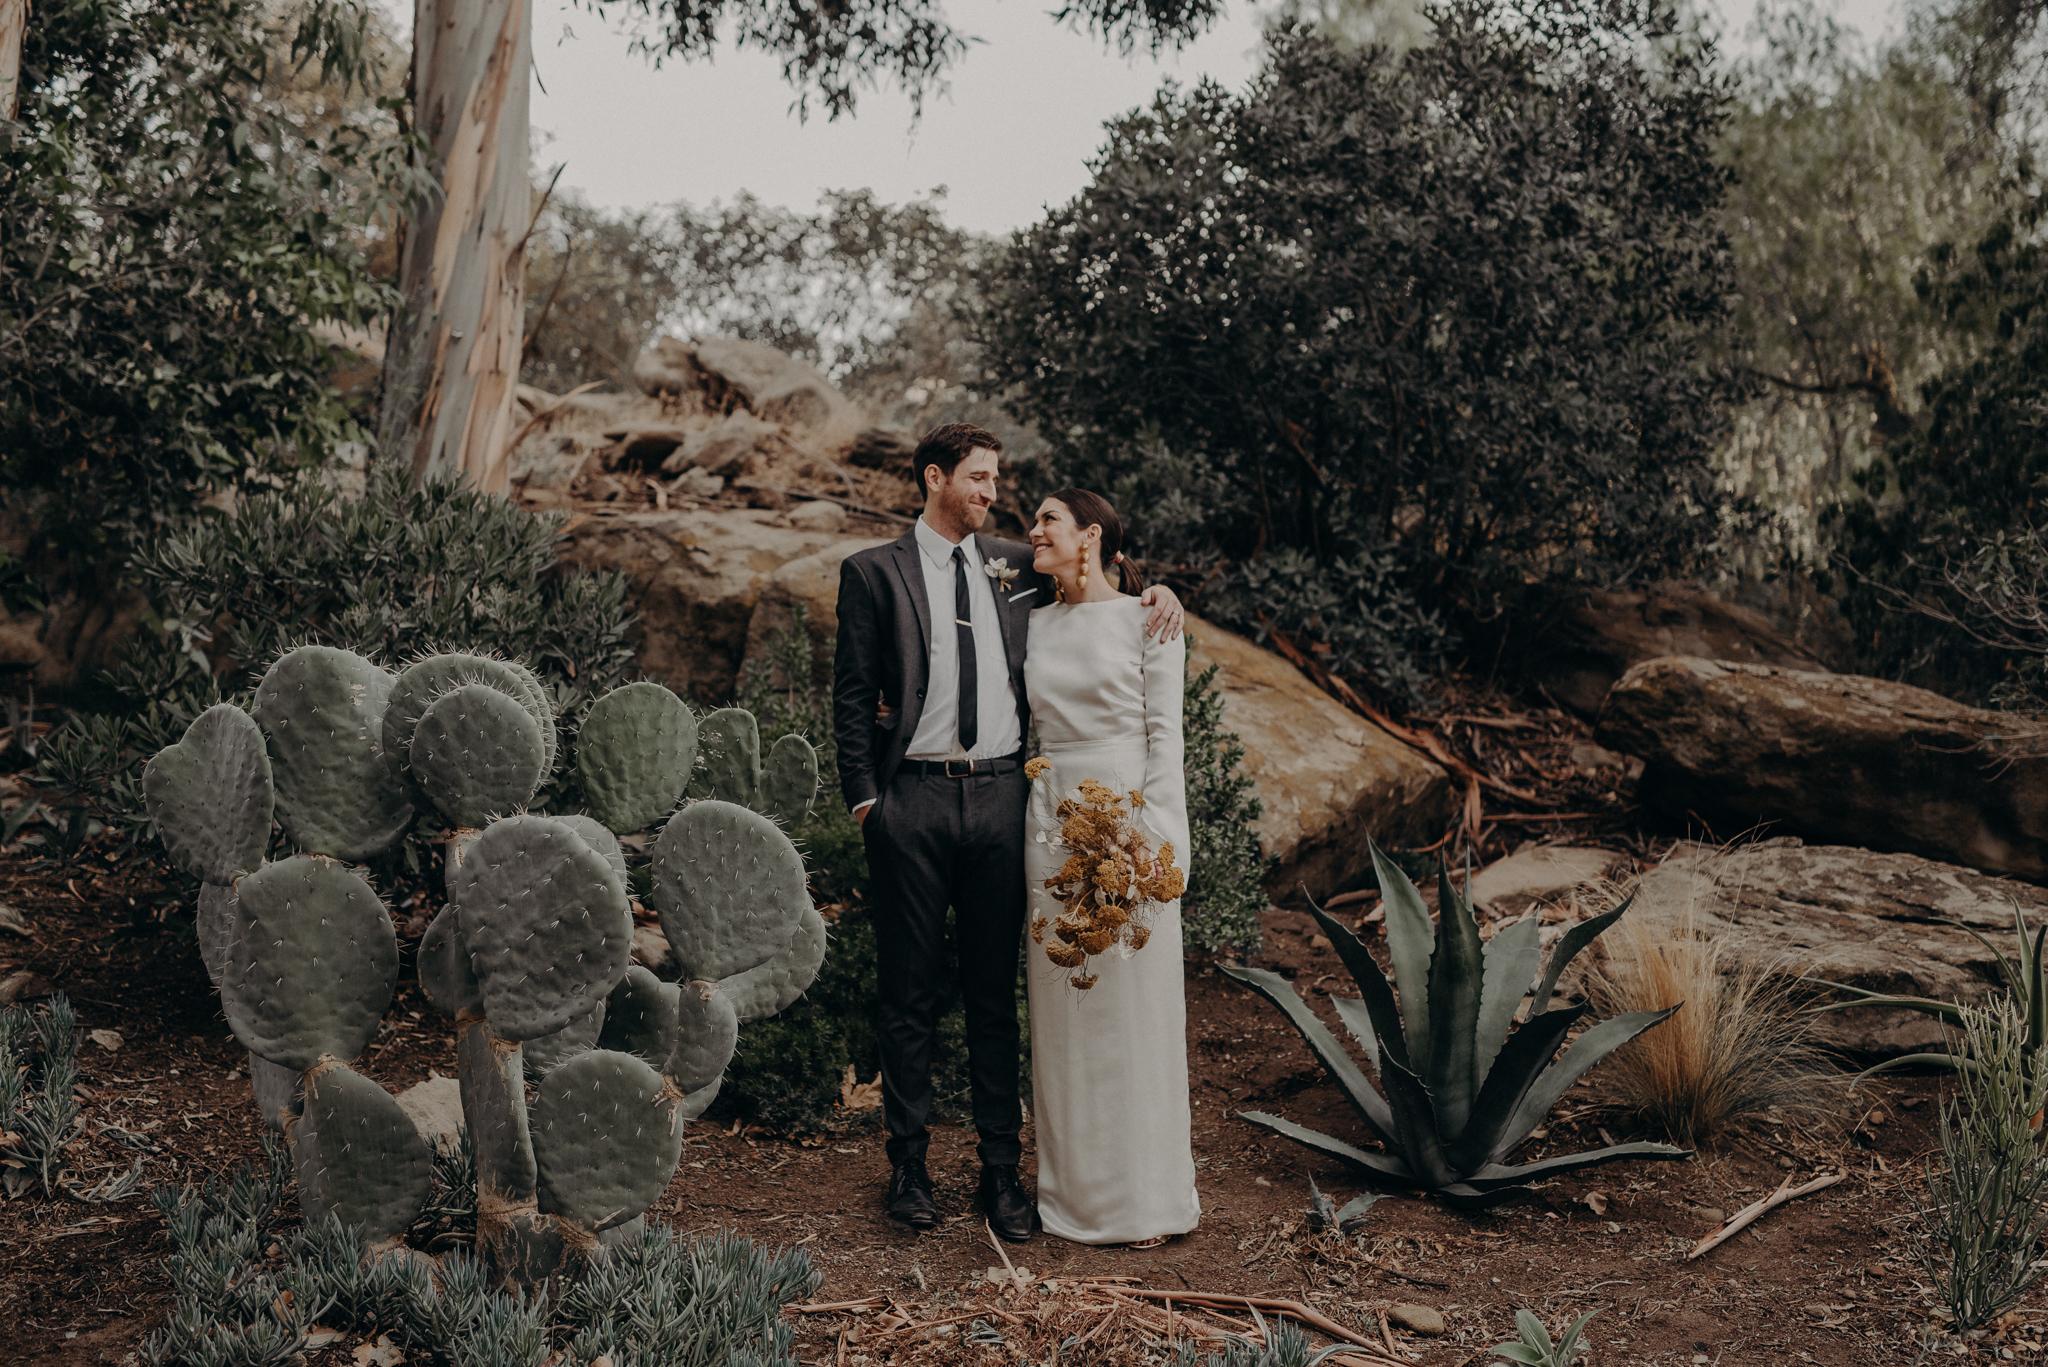 Hummingbird+Nest+Ranch+Wedding+-+Wedding+Photographer+in+Los+Angeles+-+IsaiahAndTaylor.com-066.jpg